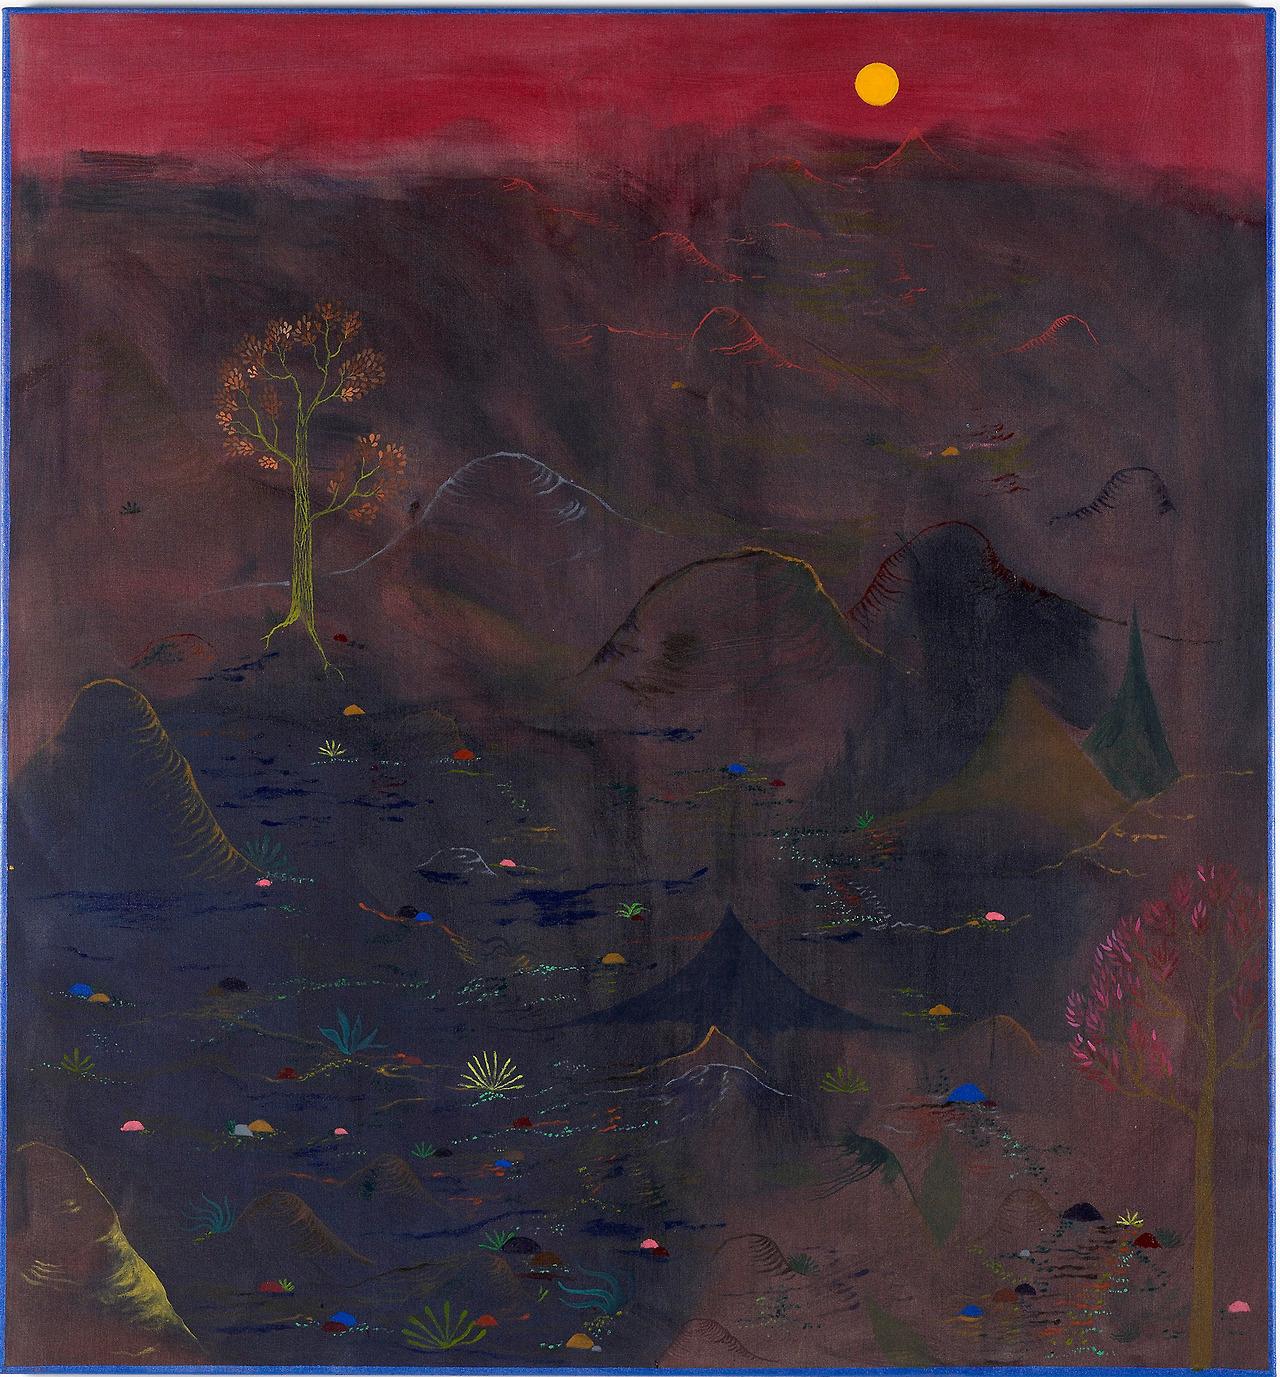 "thunderstruck9: ""Abel Auer (German, b. 1974), Kalte Felder [Cold Fields], 2011. Oil and acrylic on canvas, 140 x 130 cm. """